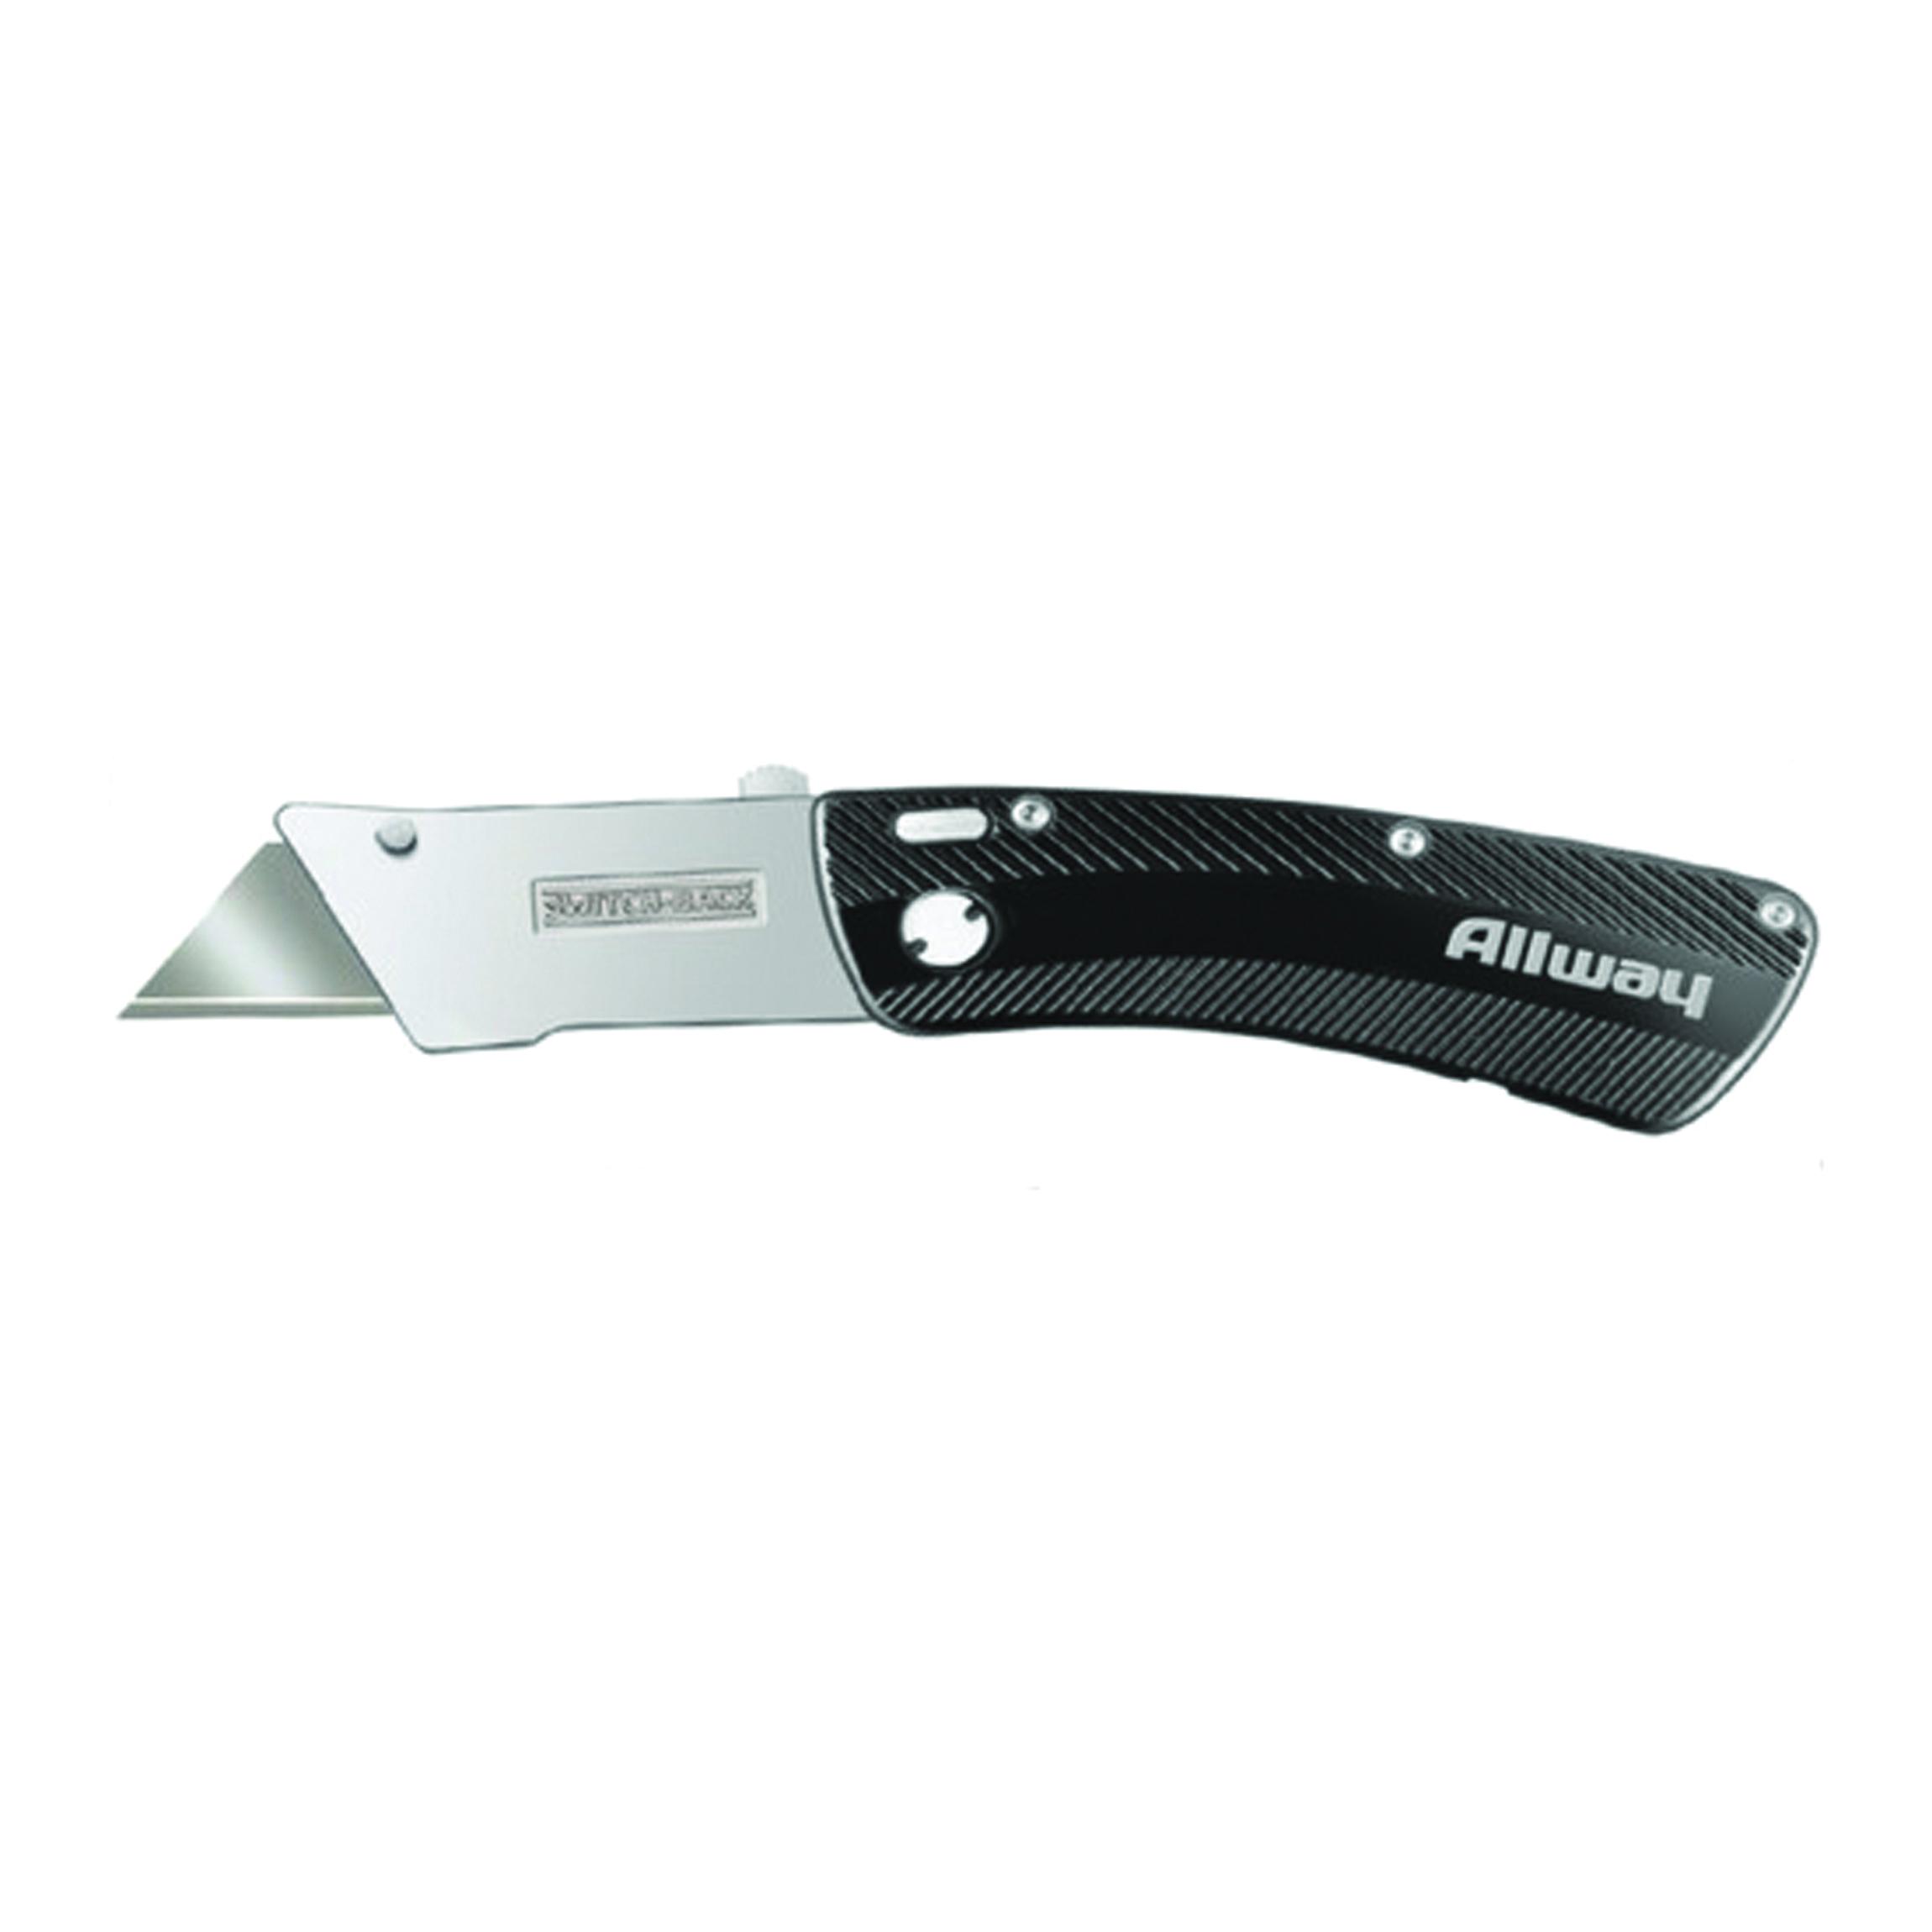 Picture of ALLWAY TOOLS SWK Utility Knife, Steel Blade, Black Handle